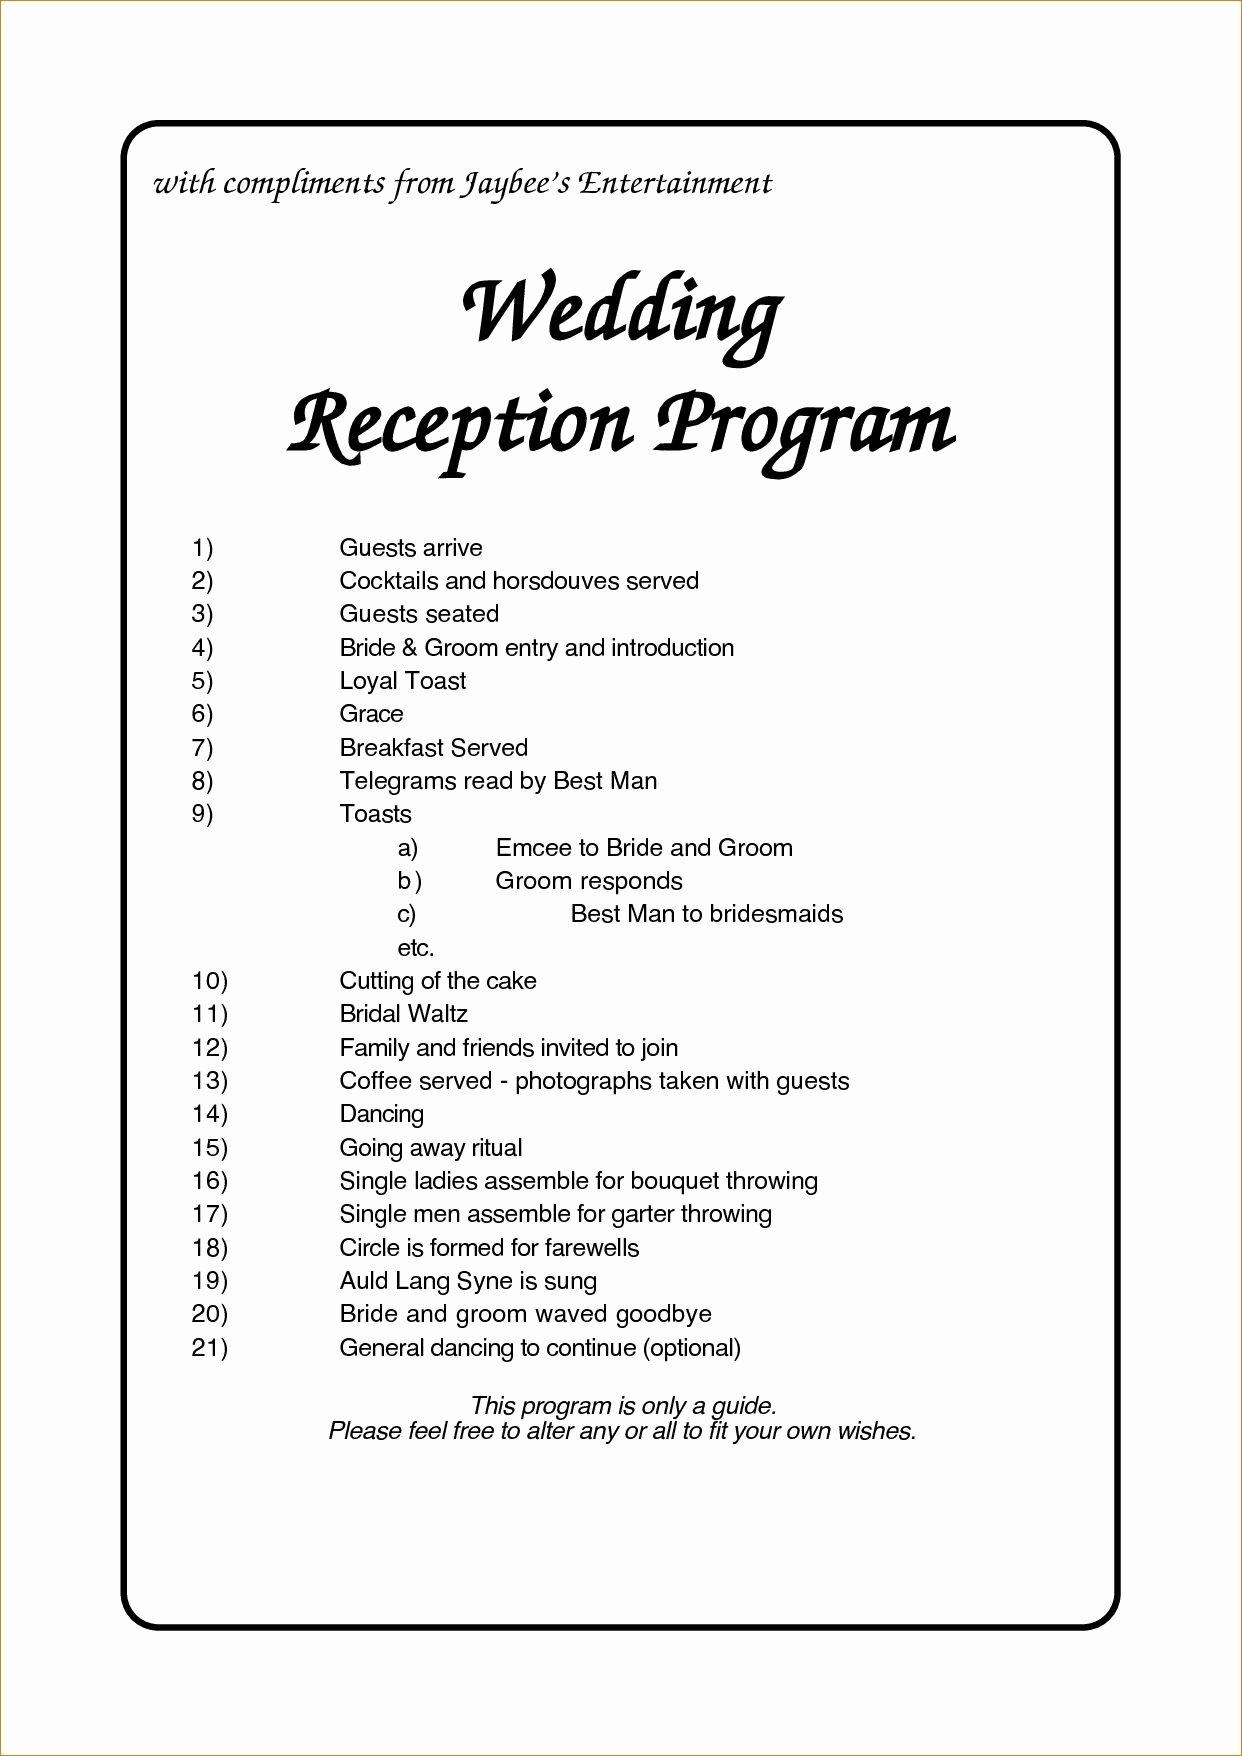 Wedding Reception Timeline Template Fresh Wedding Reception Program Template Business Plan for Free